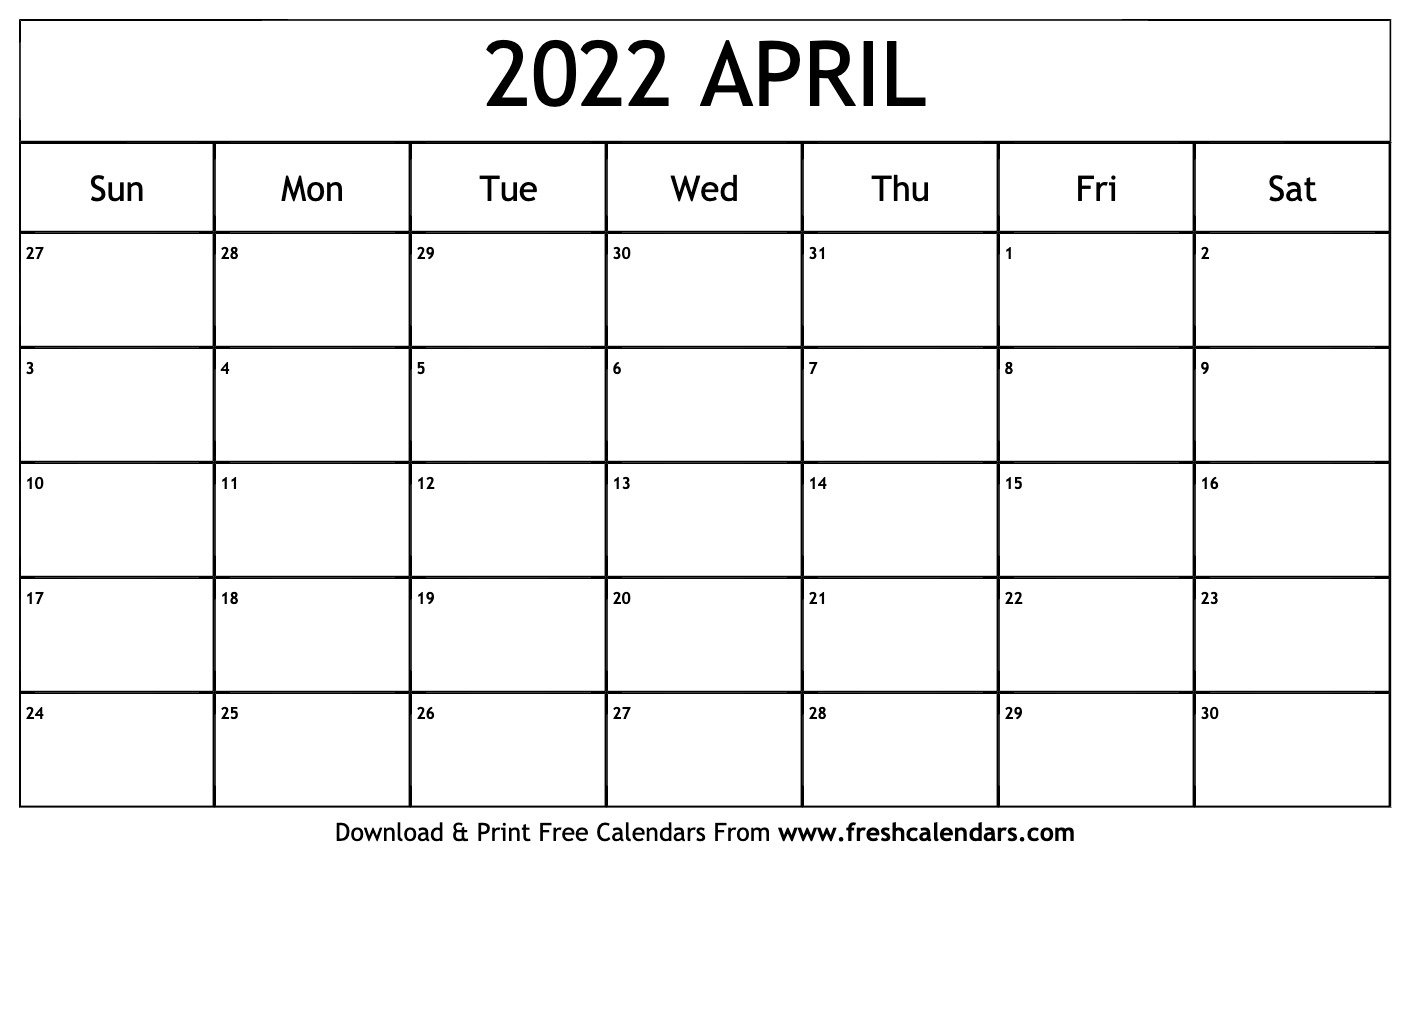 Blank Printable April 2022 Calendars regarding April May Calendar 2022 Printable